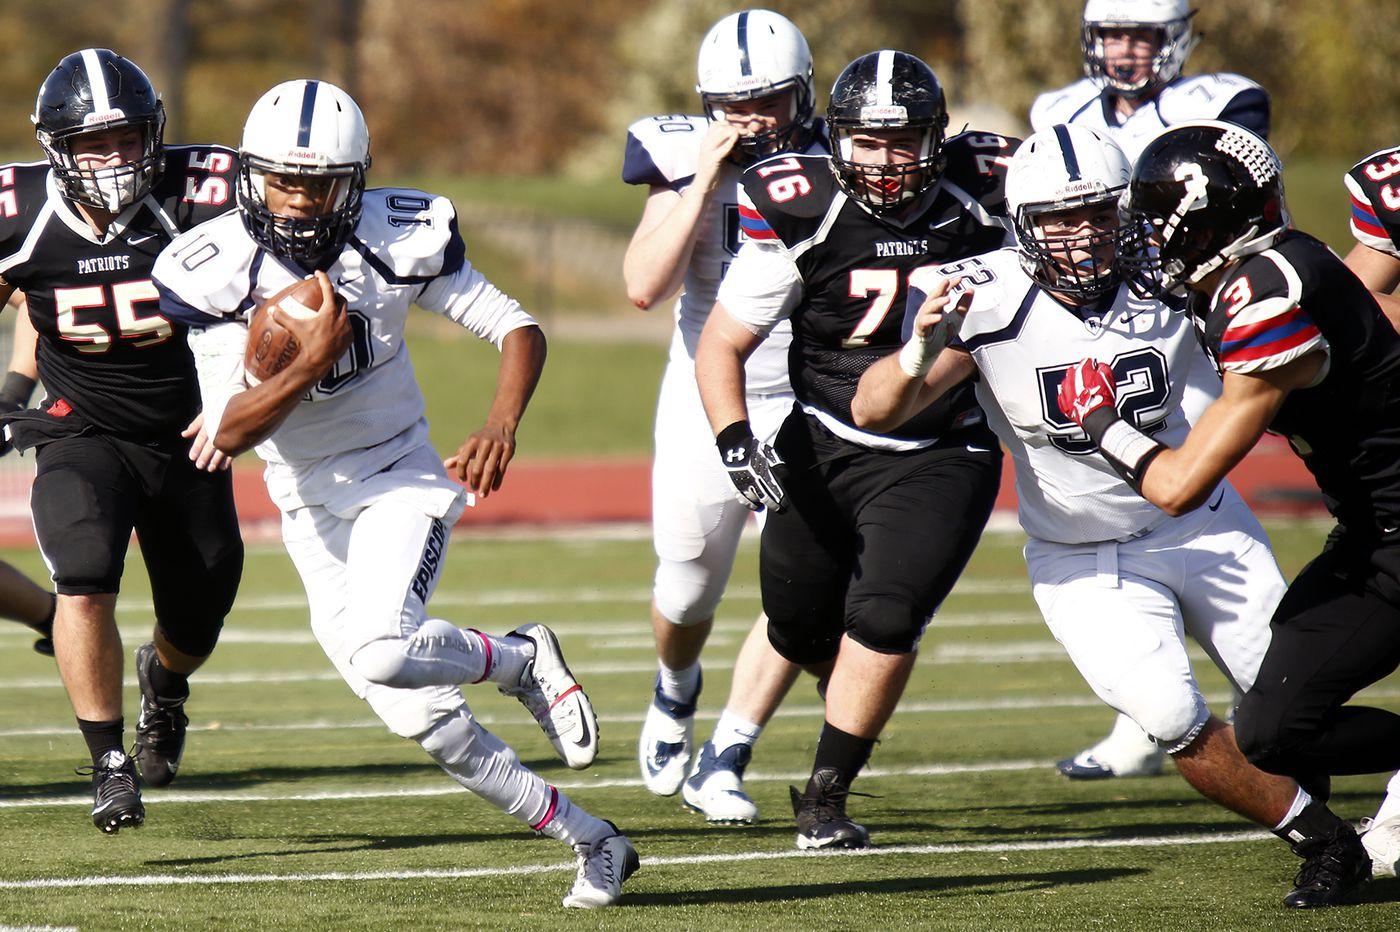 Southeastern Pa. football rankings: Episcopal Academy bursts into Top 10 in Week 4